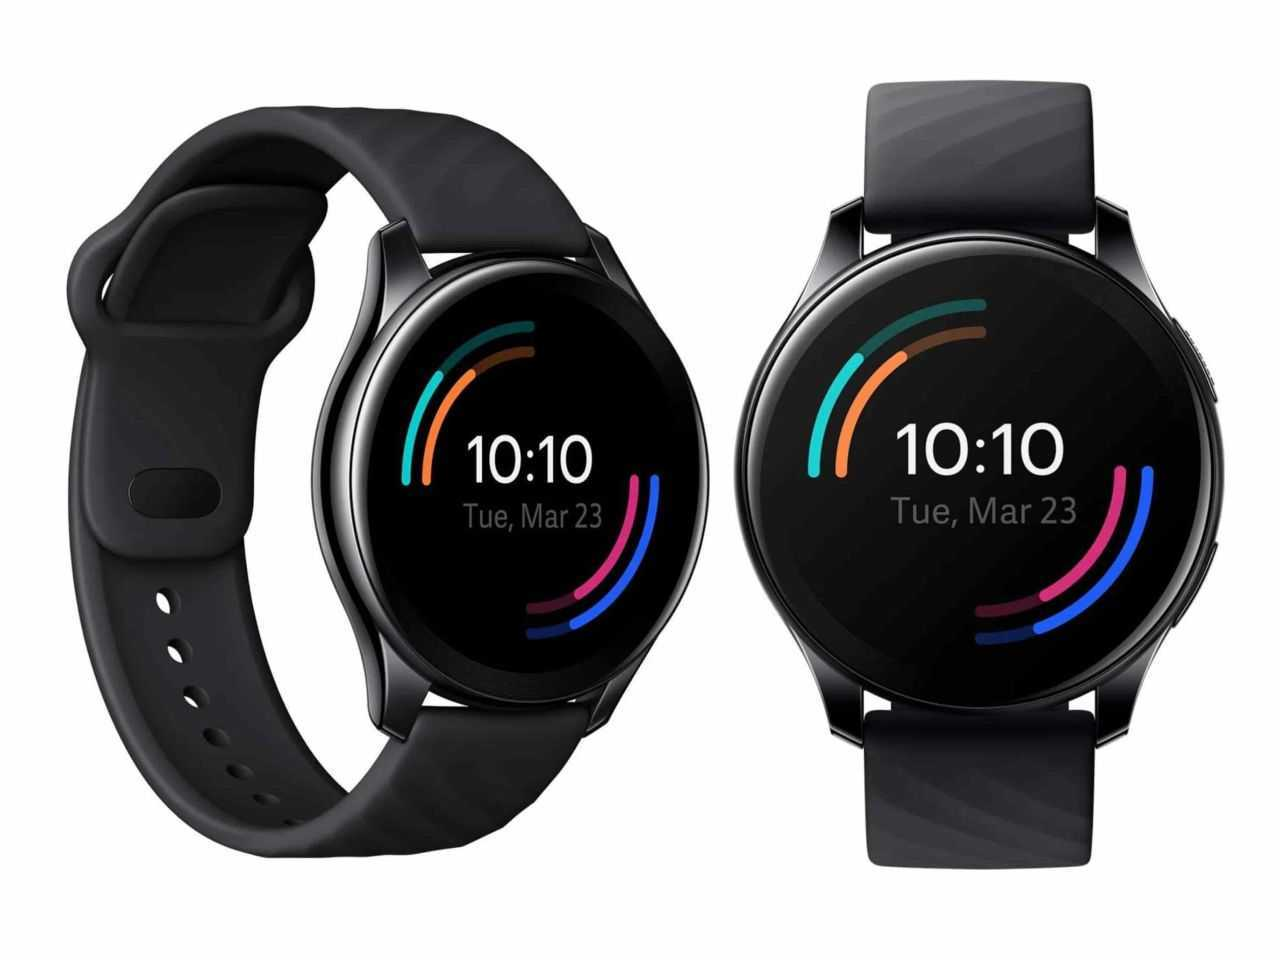 OnePlus Watch: ufficiale il nuovo smartwatch | Prezzo